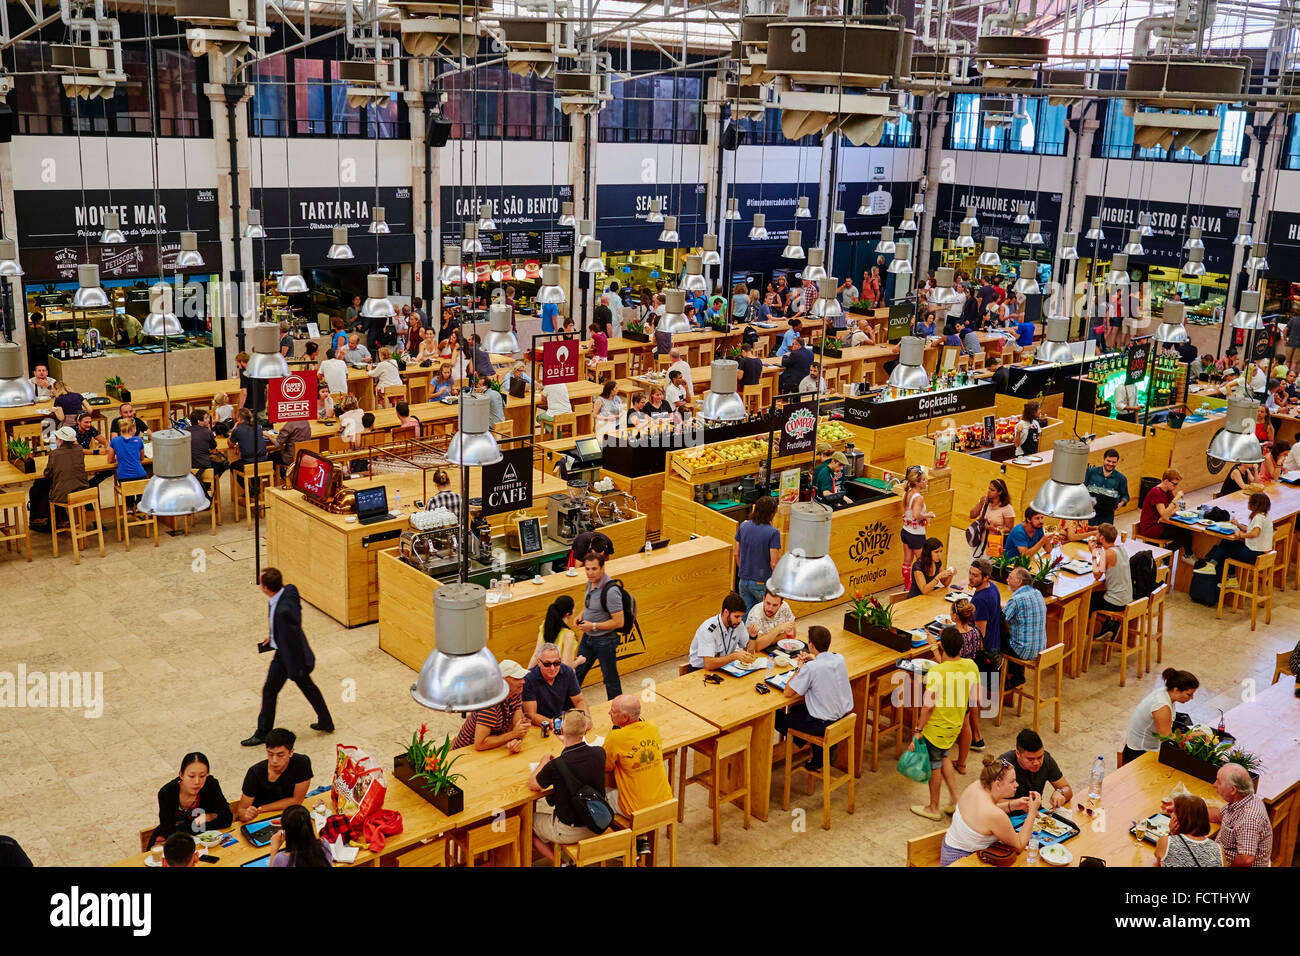 Portugal Lisbon food court Time Out Mercado da Ribeira Stock Photo ... 3dc31d52dc655